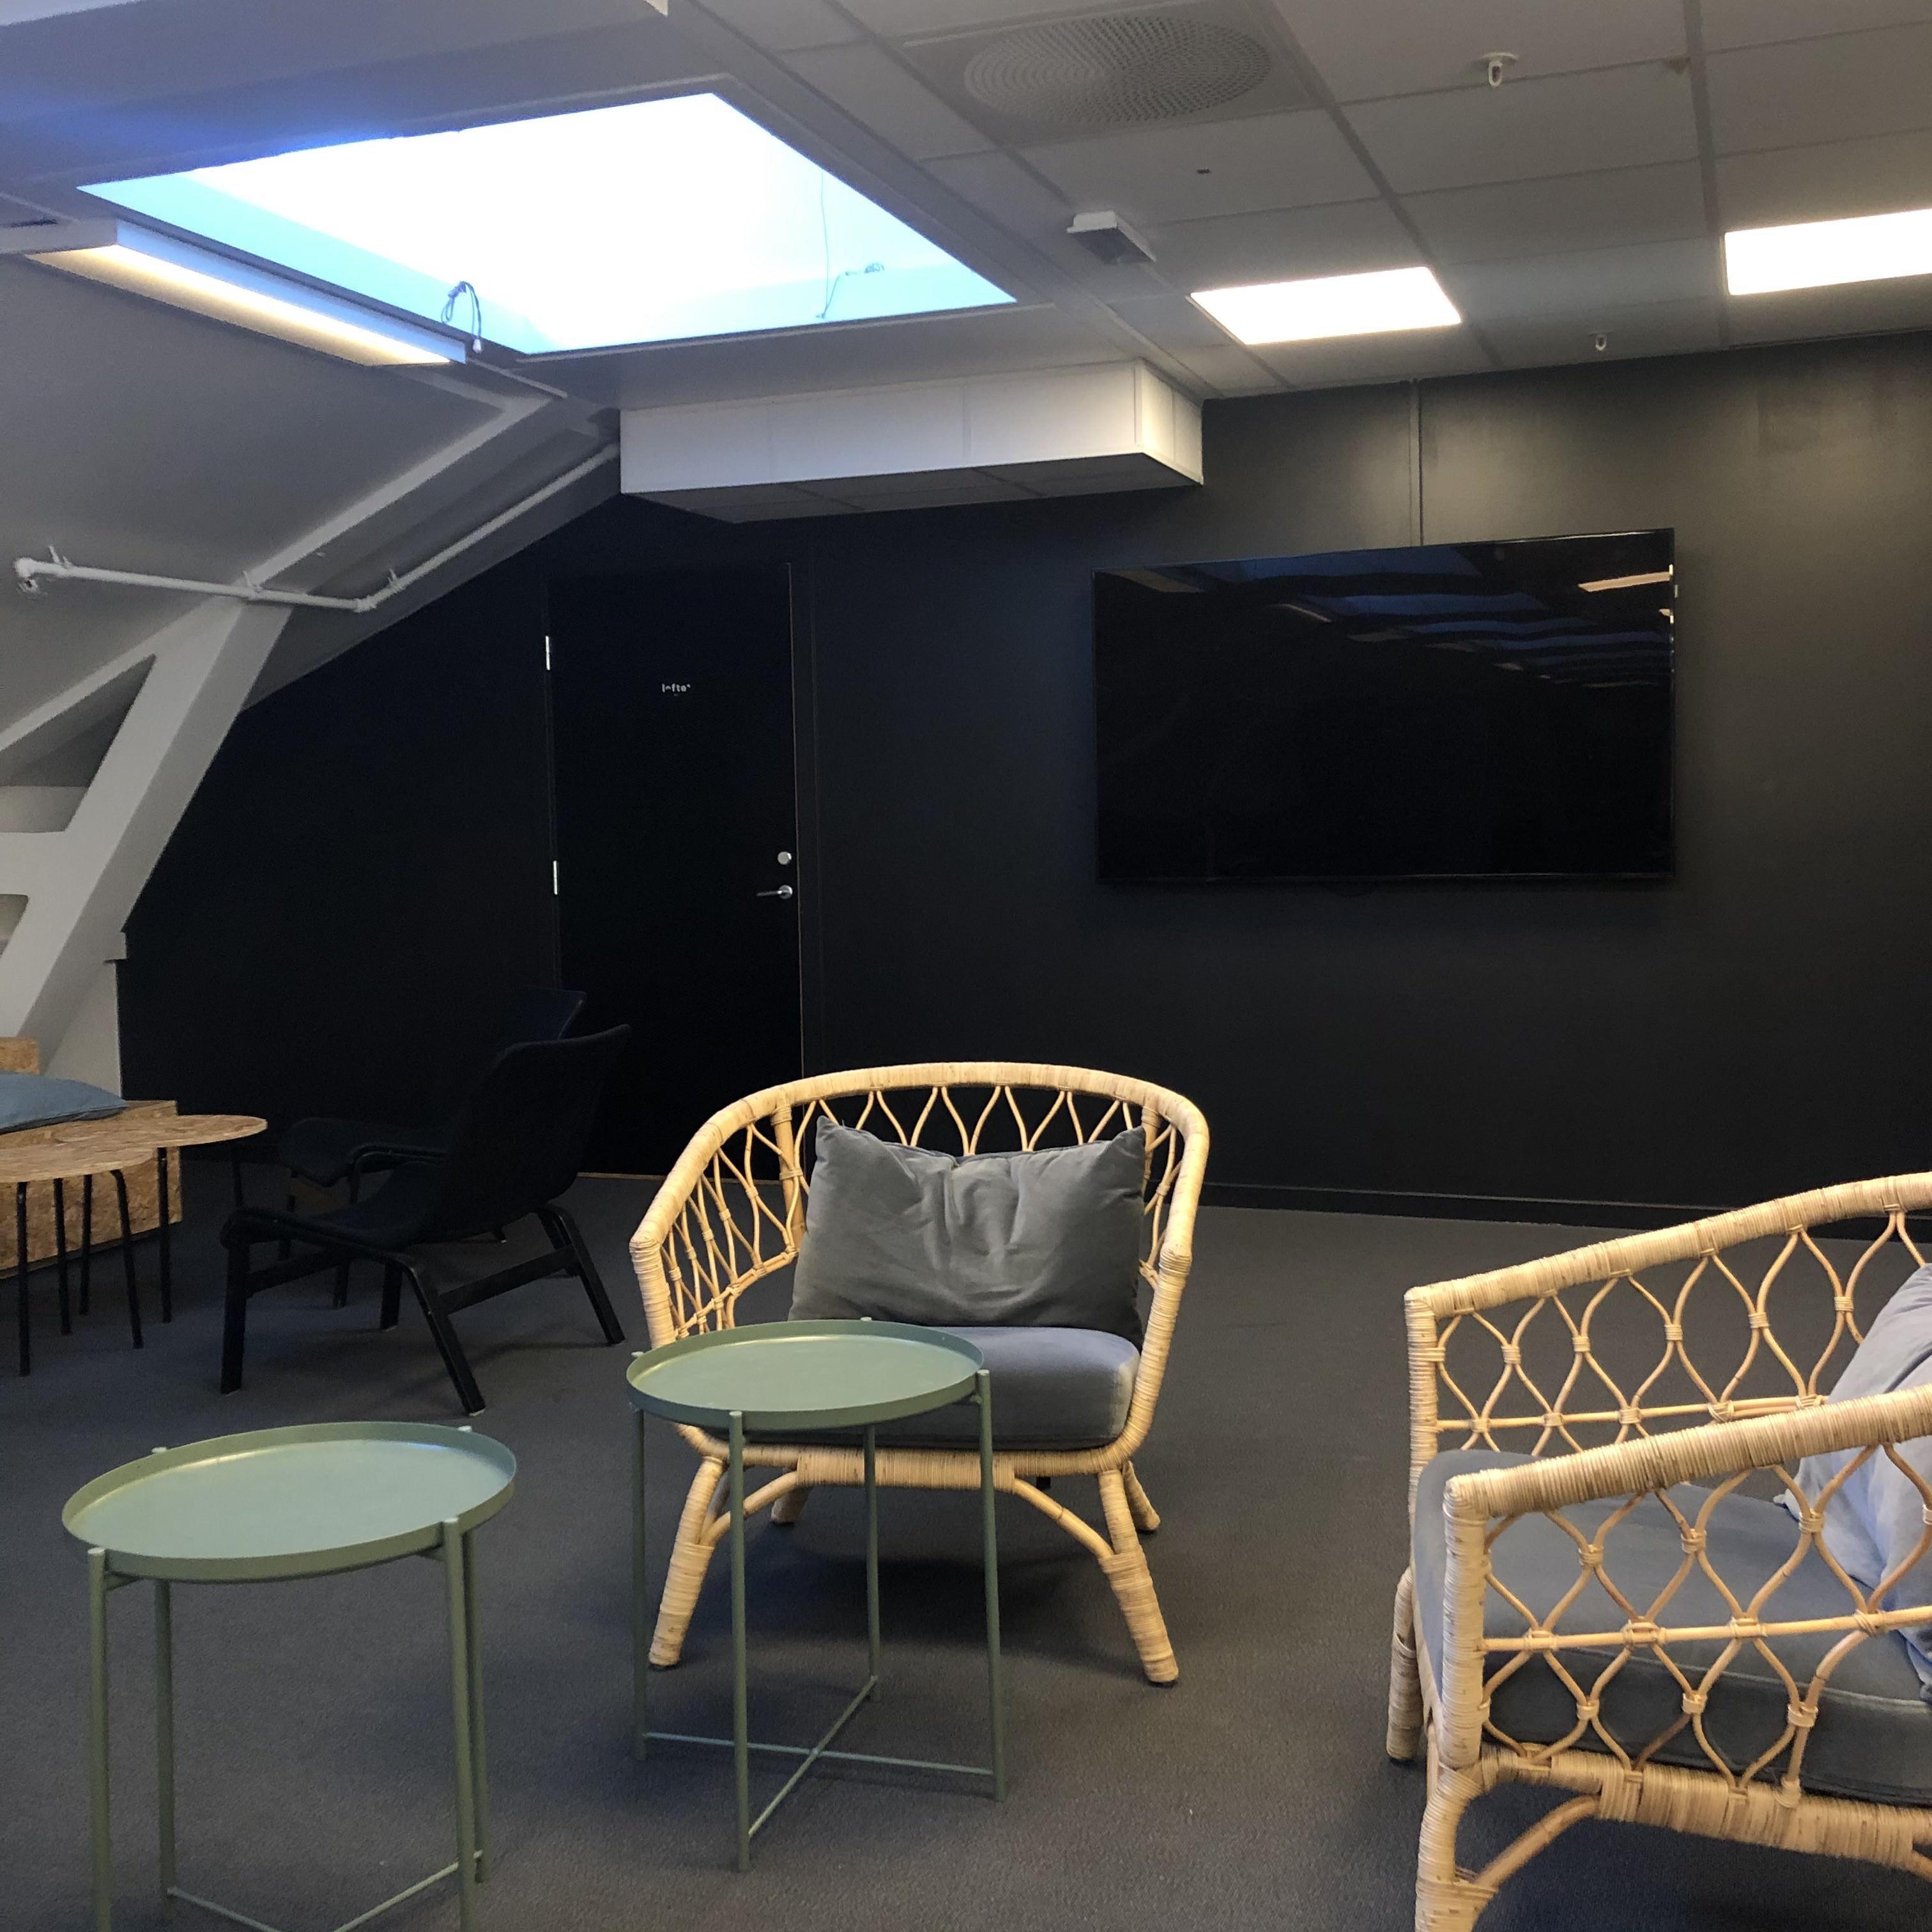 Ish studio kontor kongens gate 22